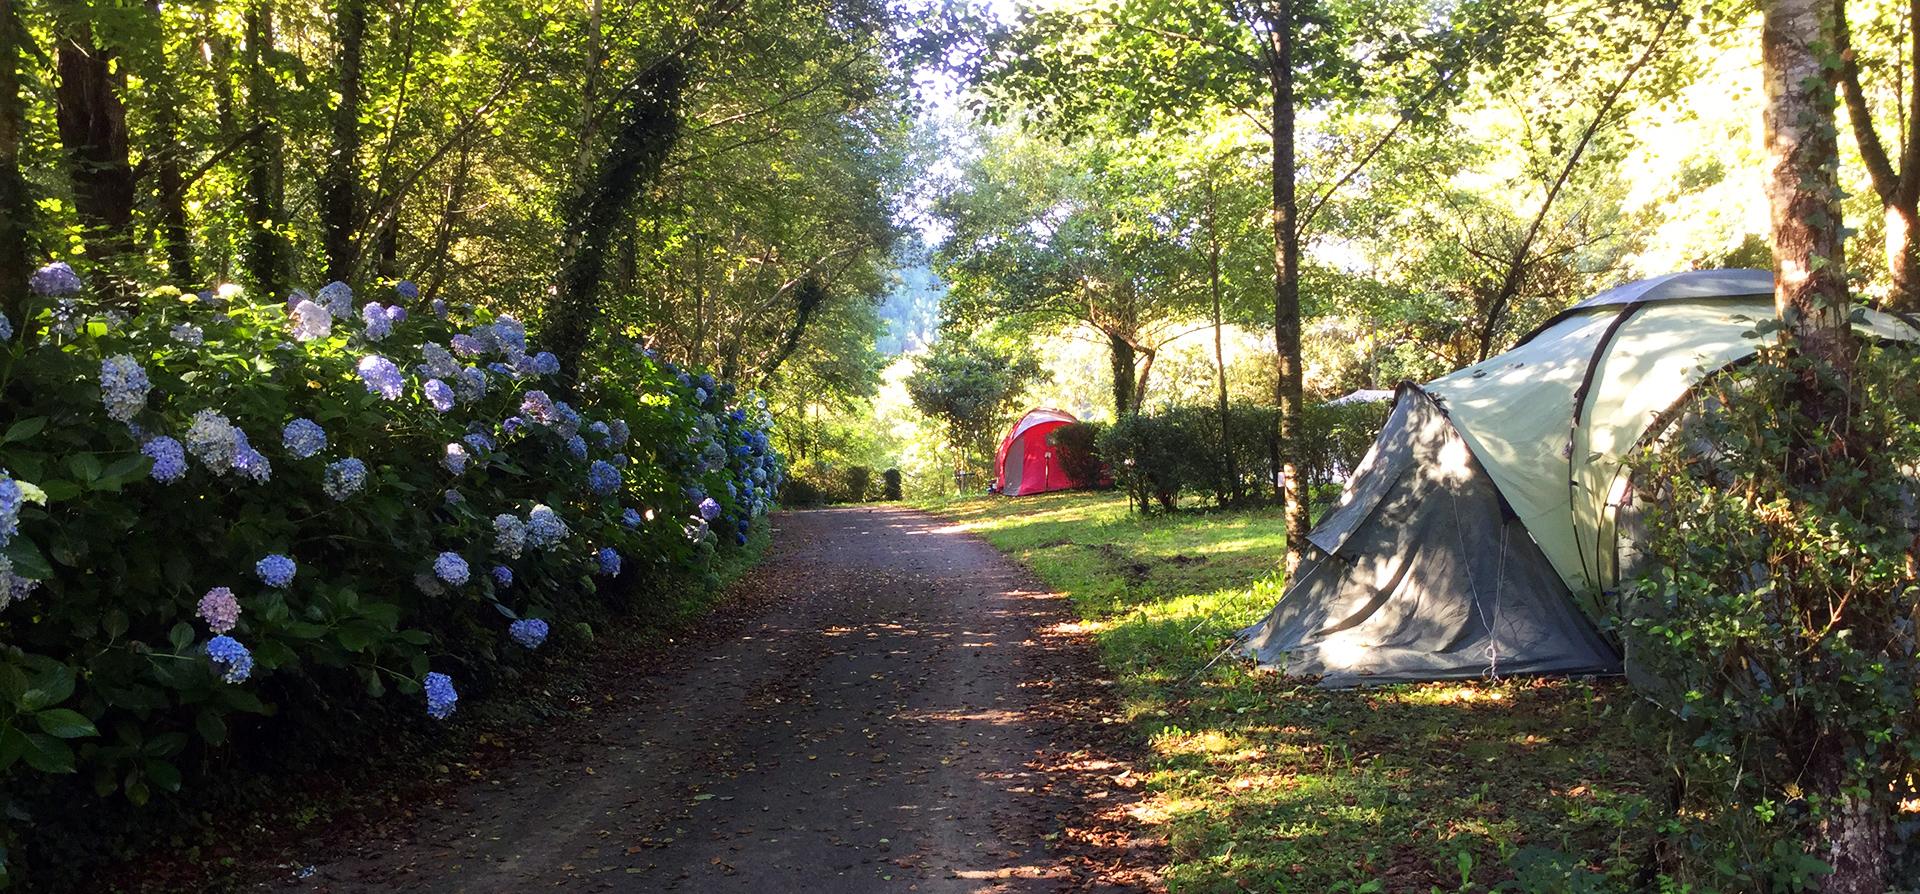 Zingira Camping